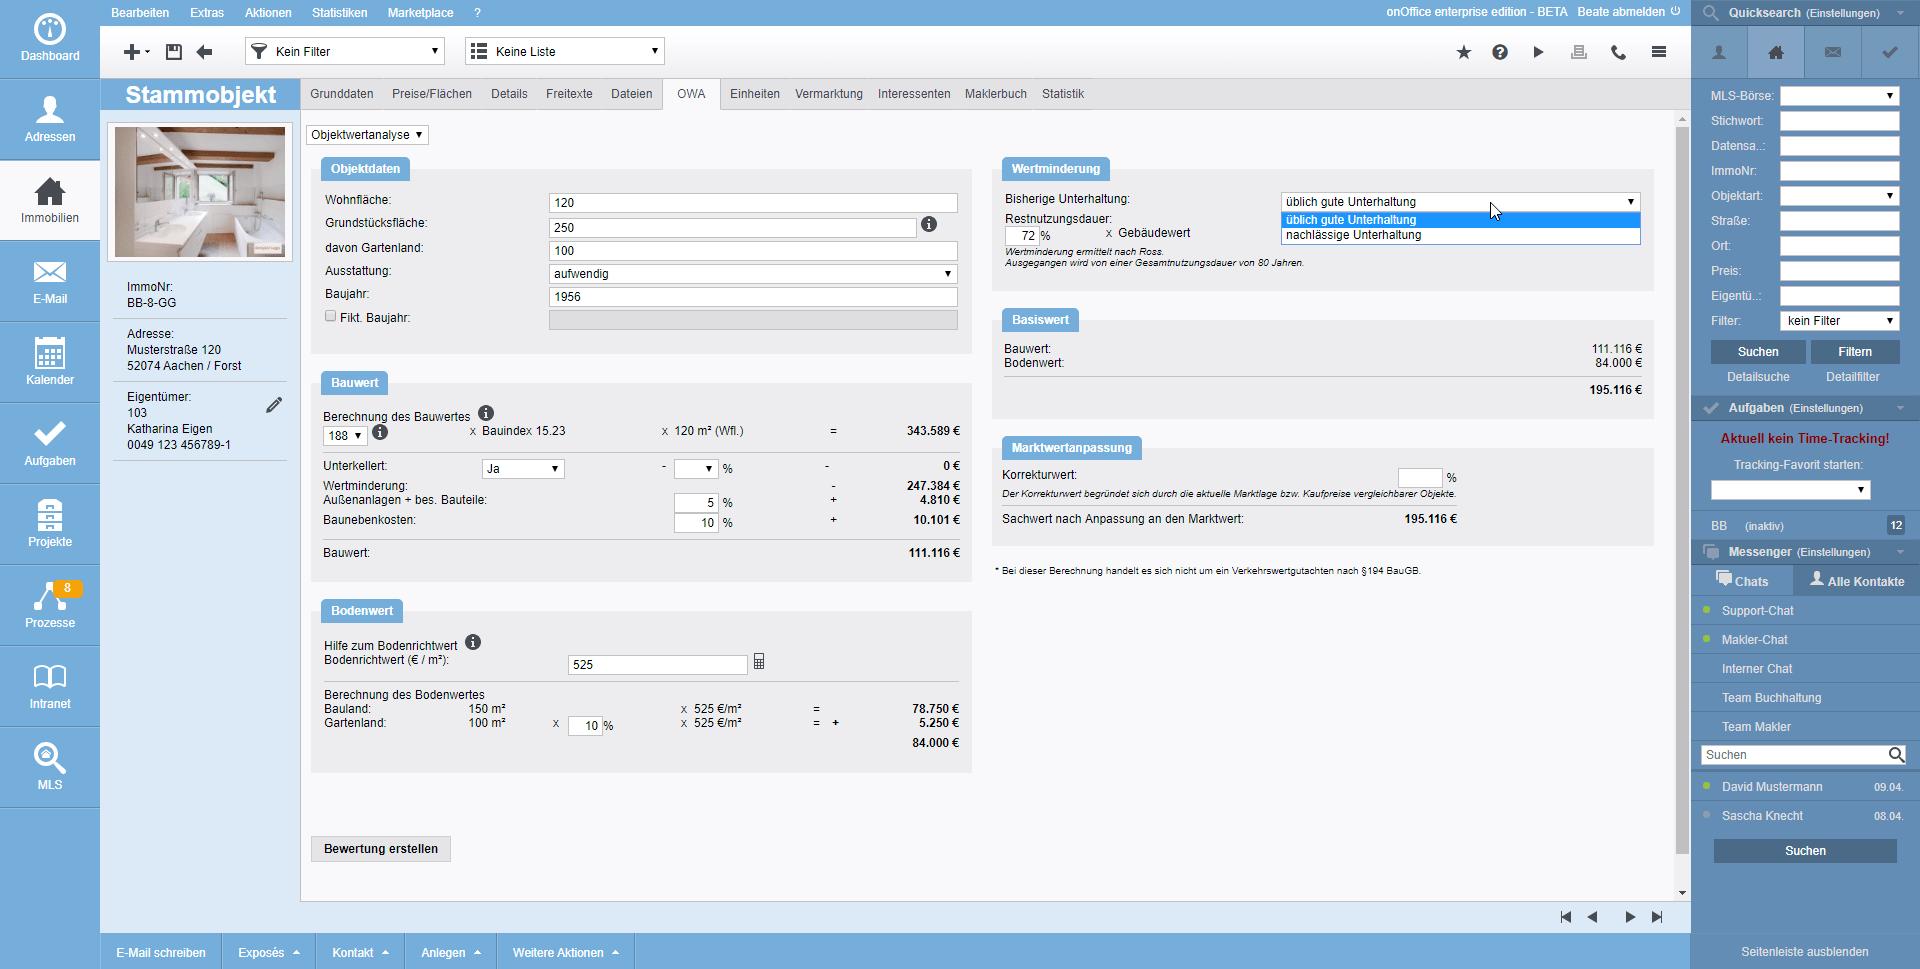 Screenshot Objektwertanalyse